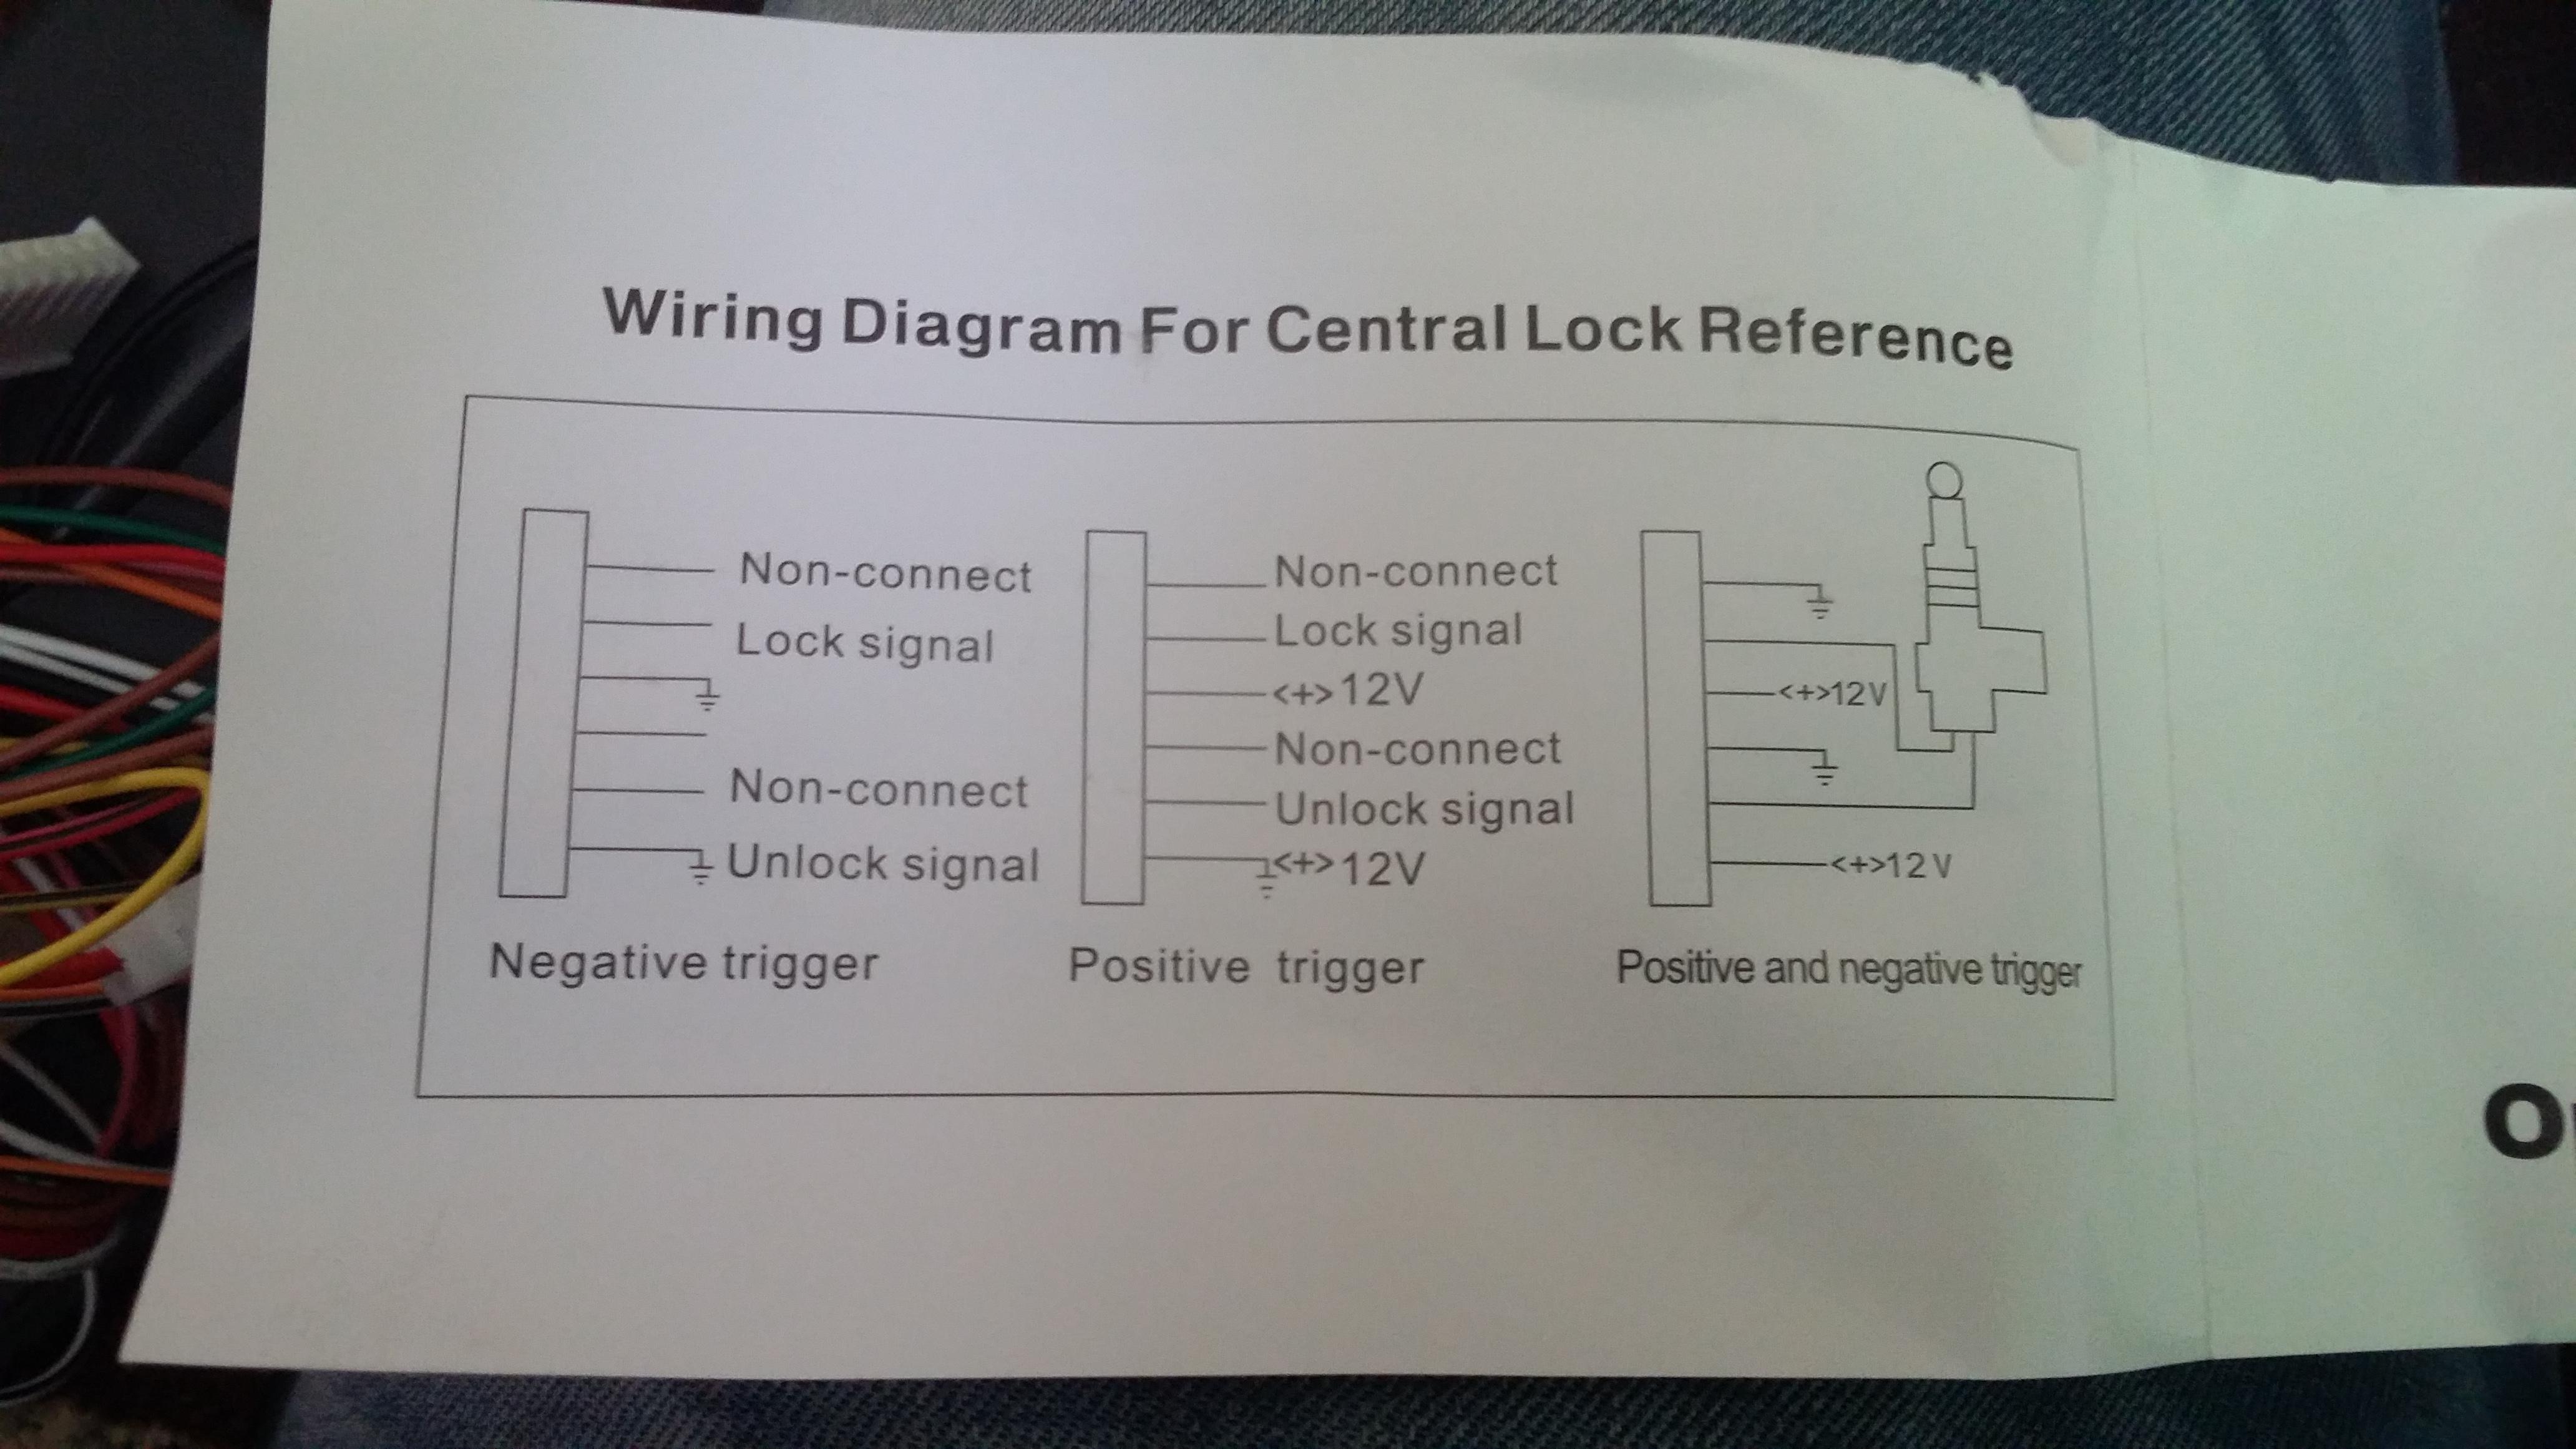 remote central locking wiring diagram remote image astra g central locking wiring diagram astra auto wiring diagram on remote central locking wiring diagram